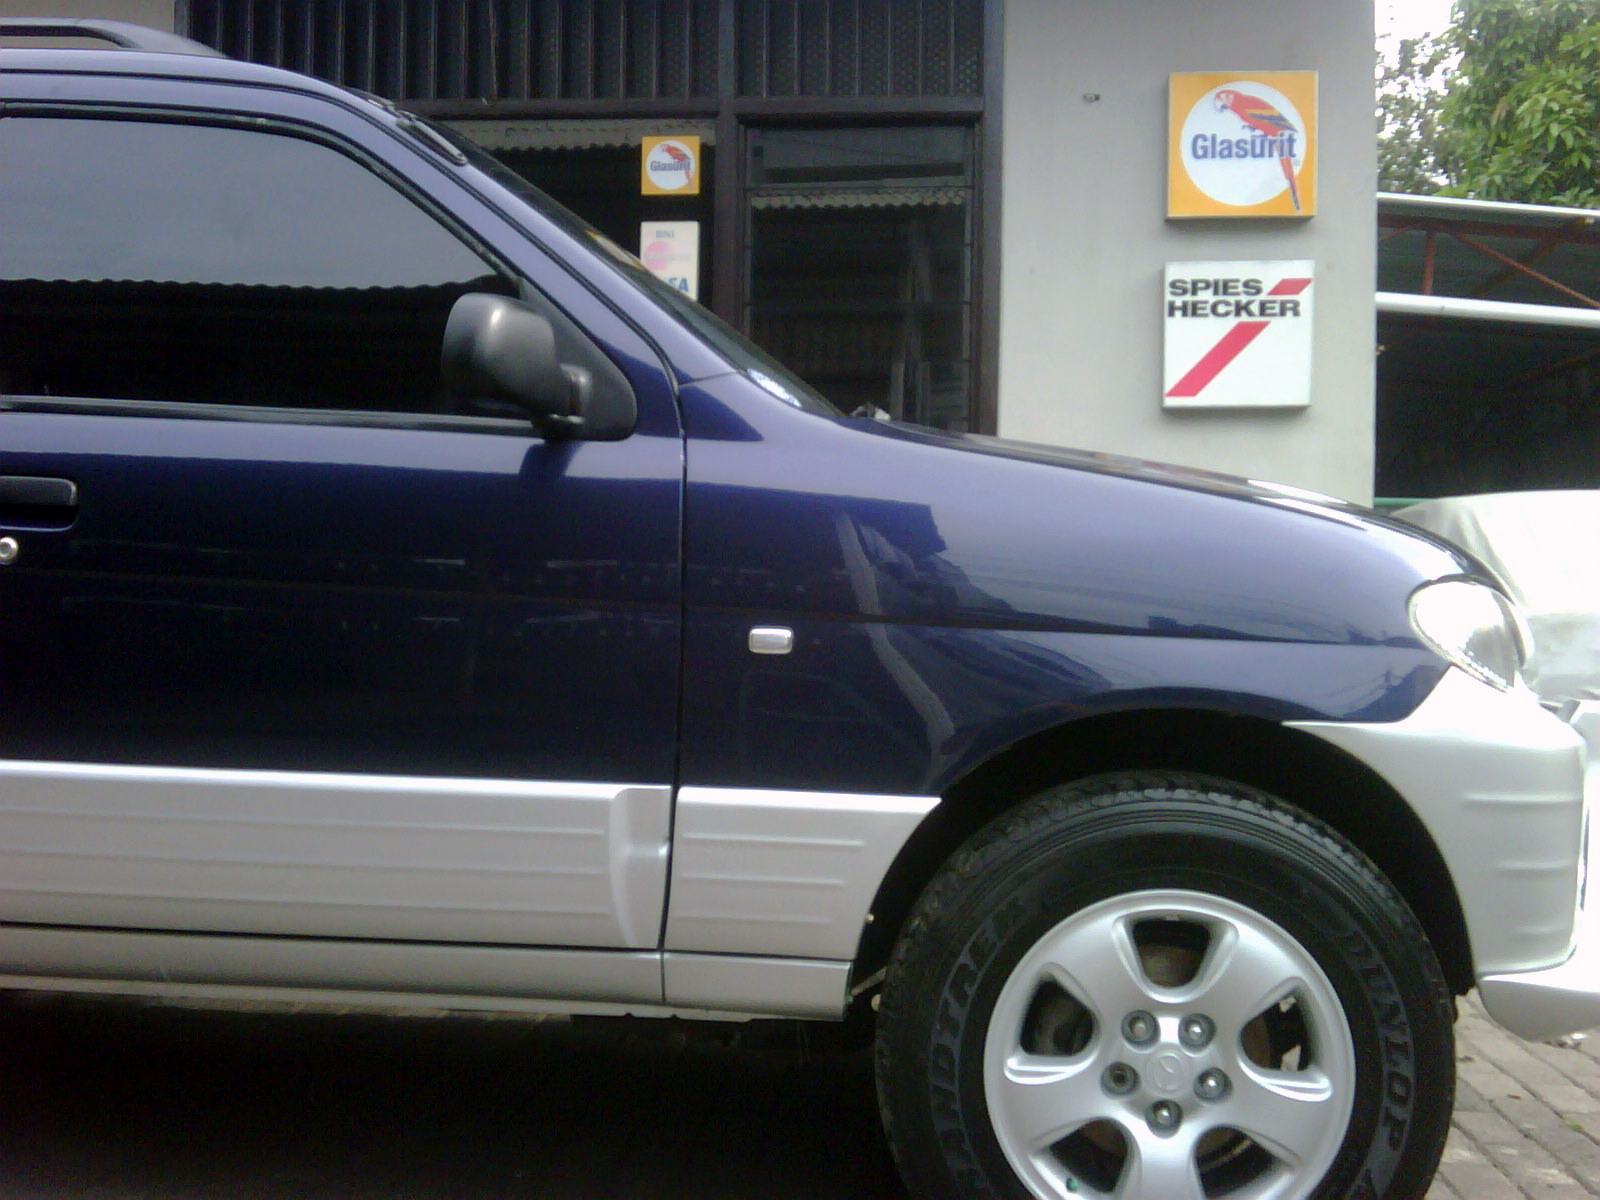 2000 Daihatsu Taruna CSX GARASI 64